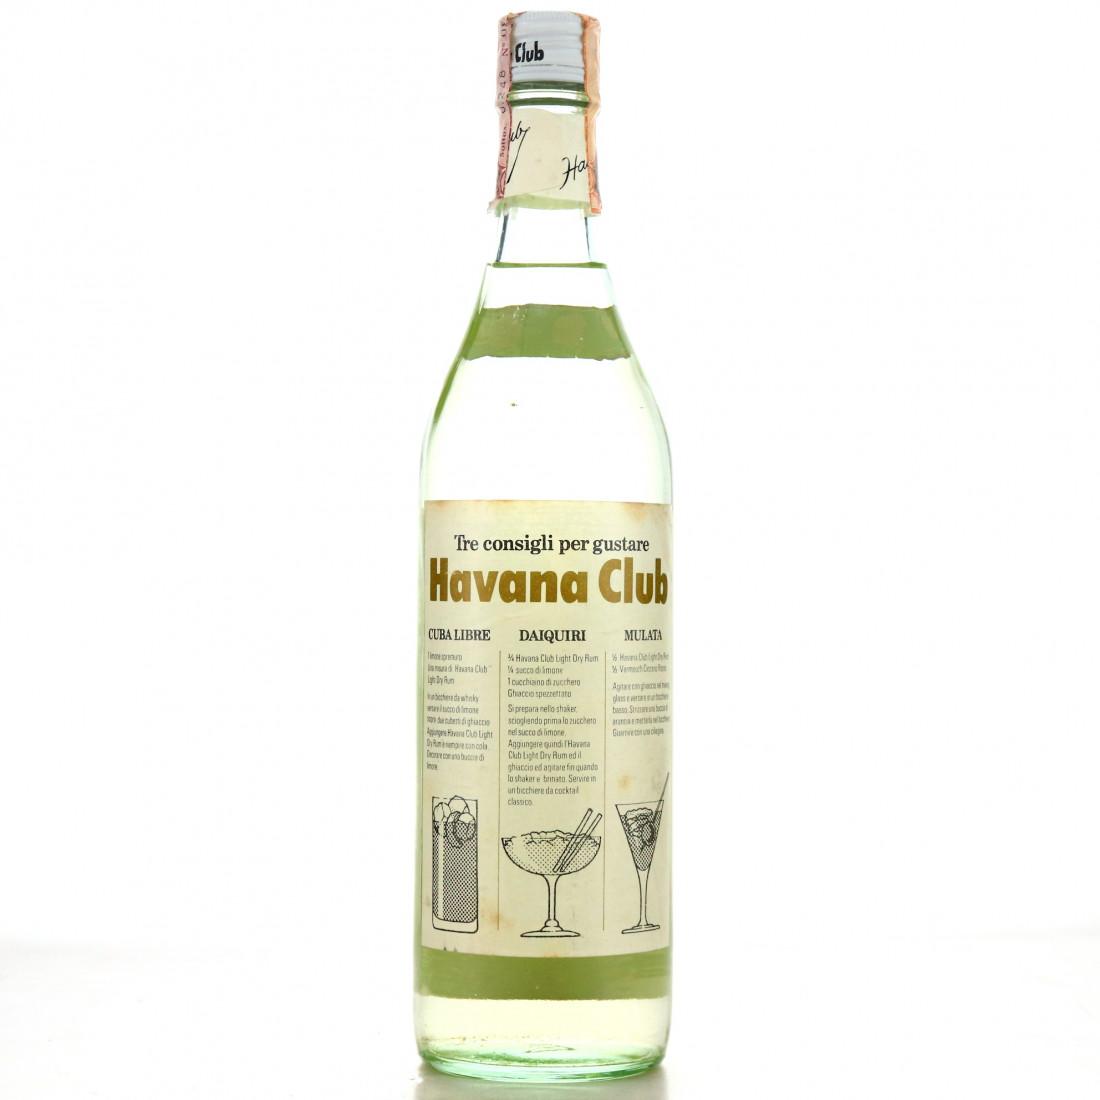 Havana Club 3 Year Old Light-Dry 1970s / Cinzano Import